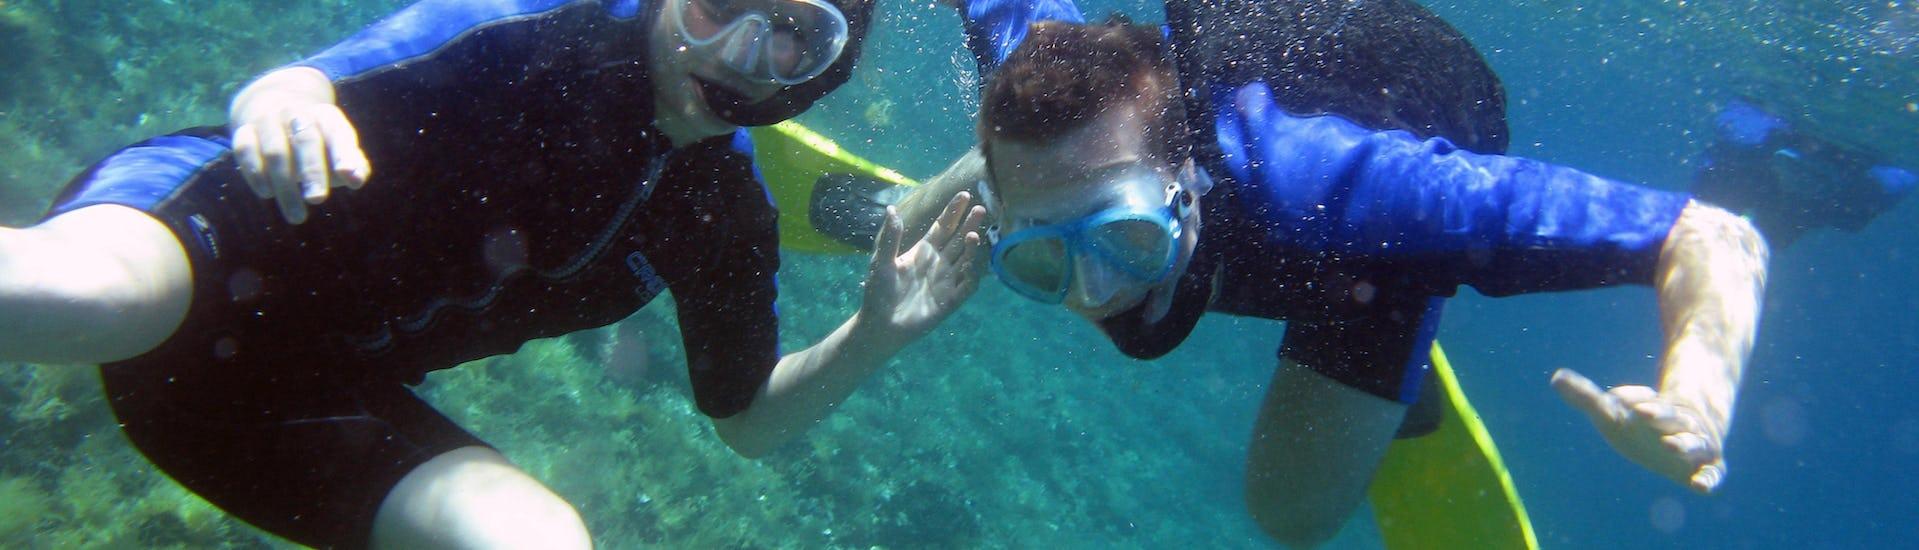 snorkeling-near-athens-nea-makri-kanelakis-diving-experiences